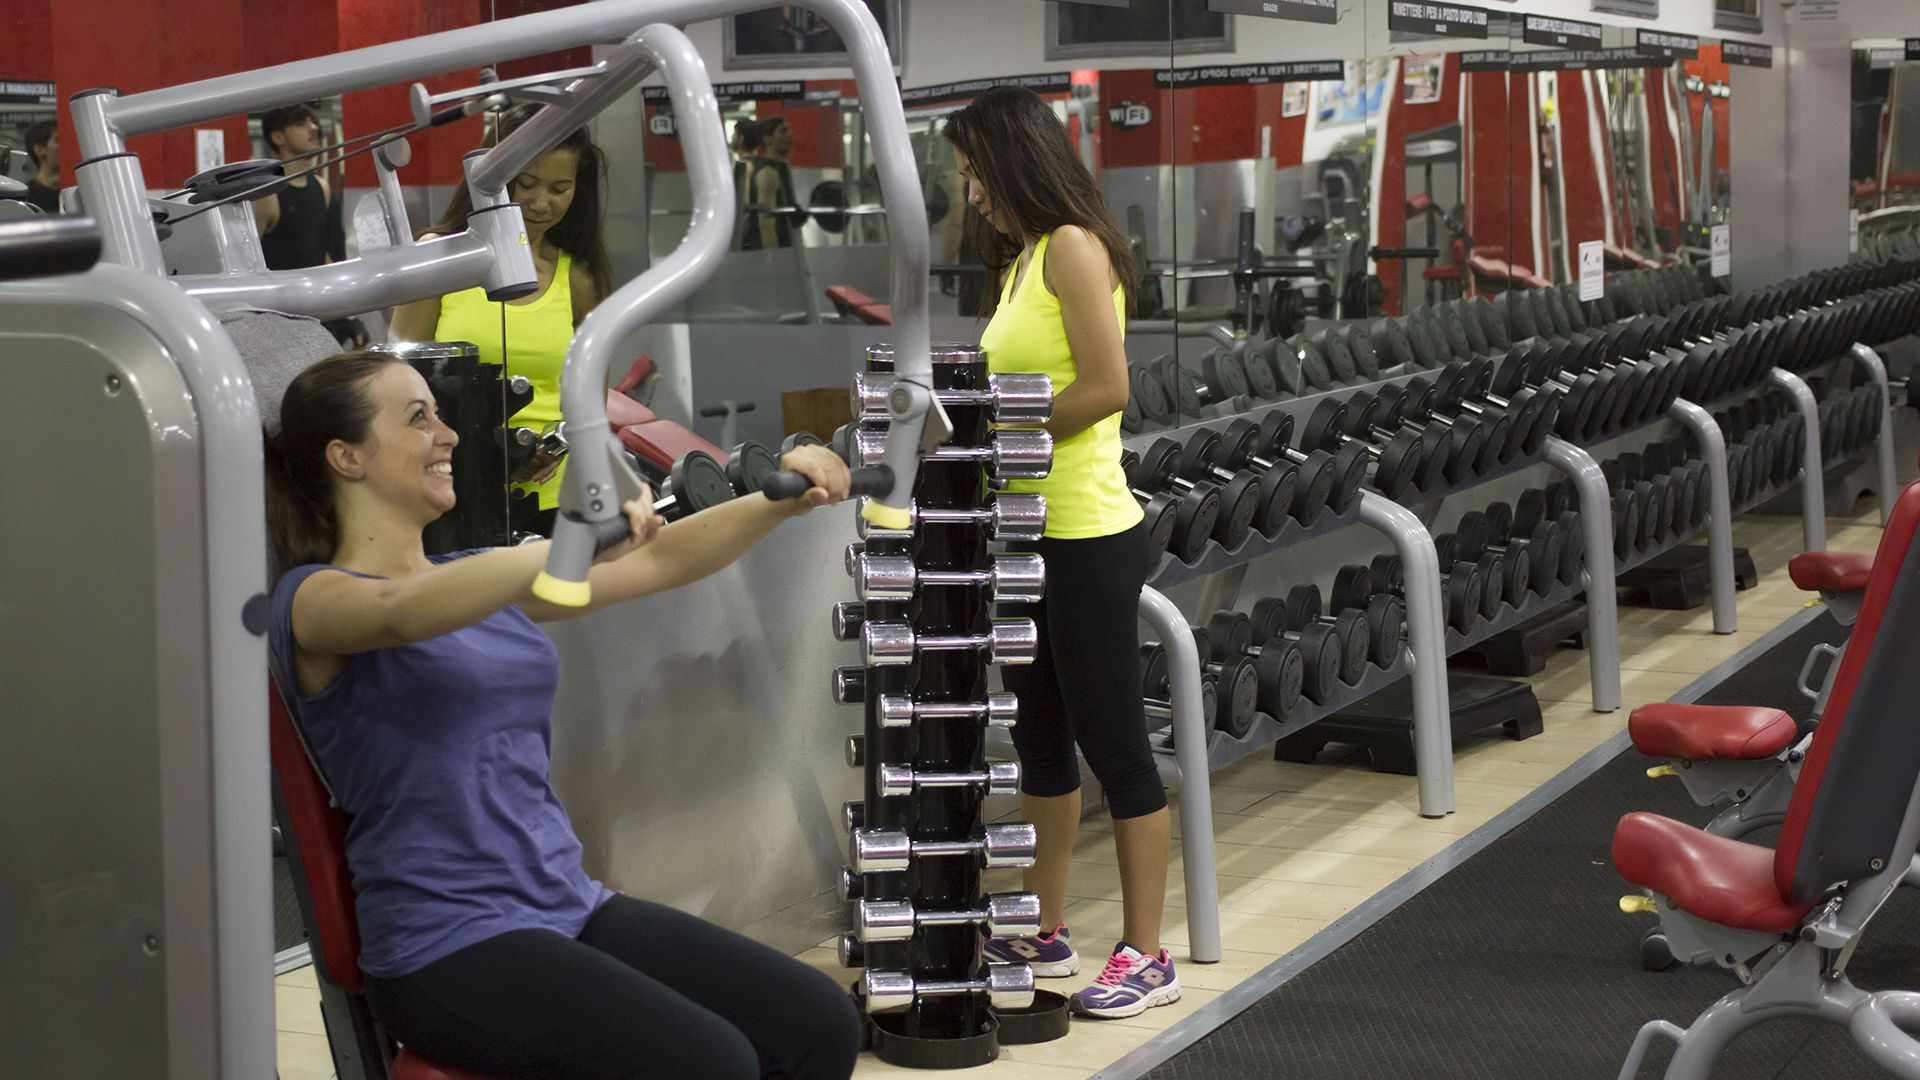 Allenamento e Pesi Palestra Time Fitness Roma Quadraro